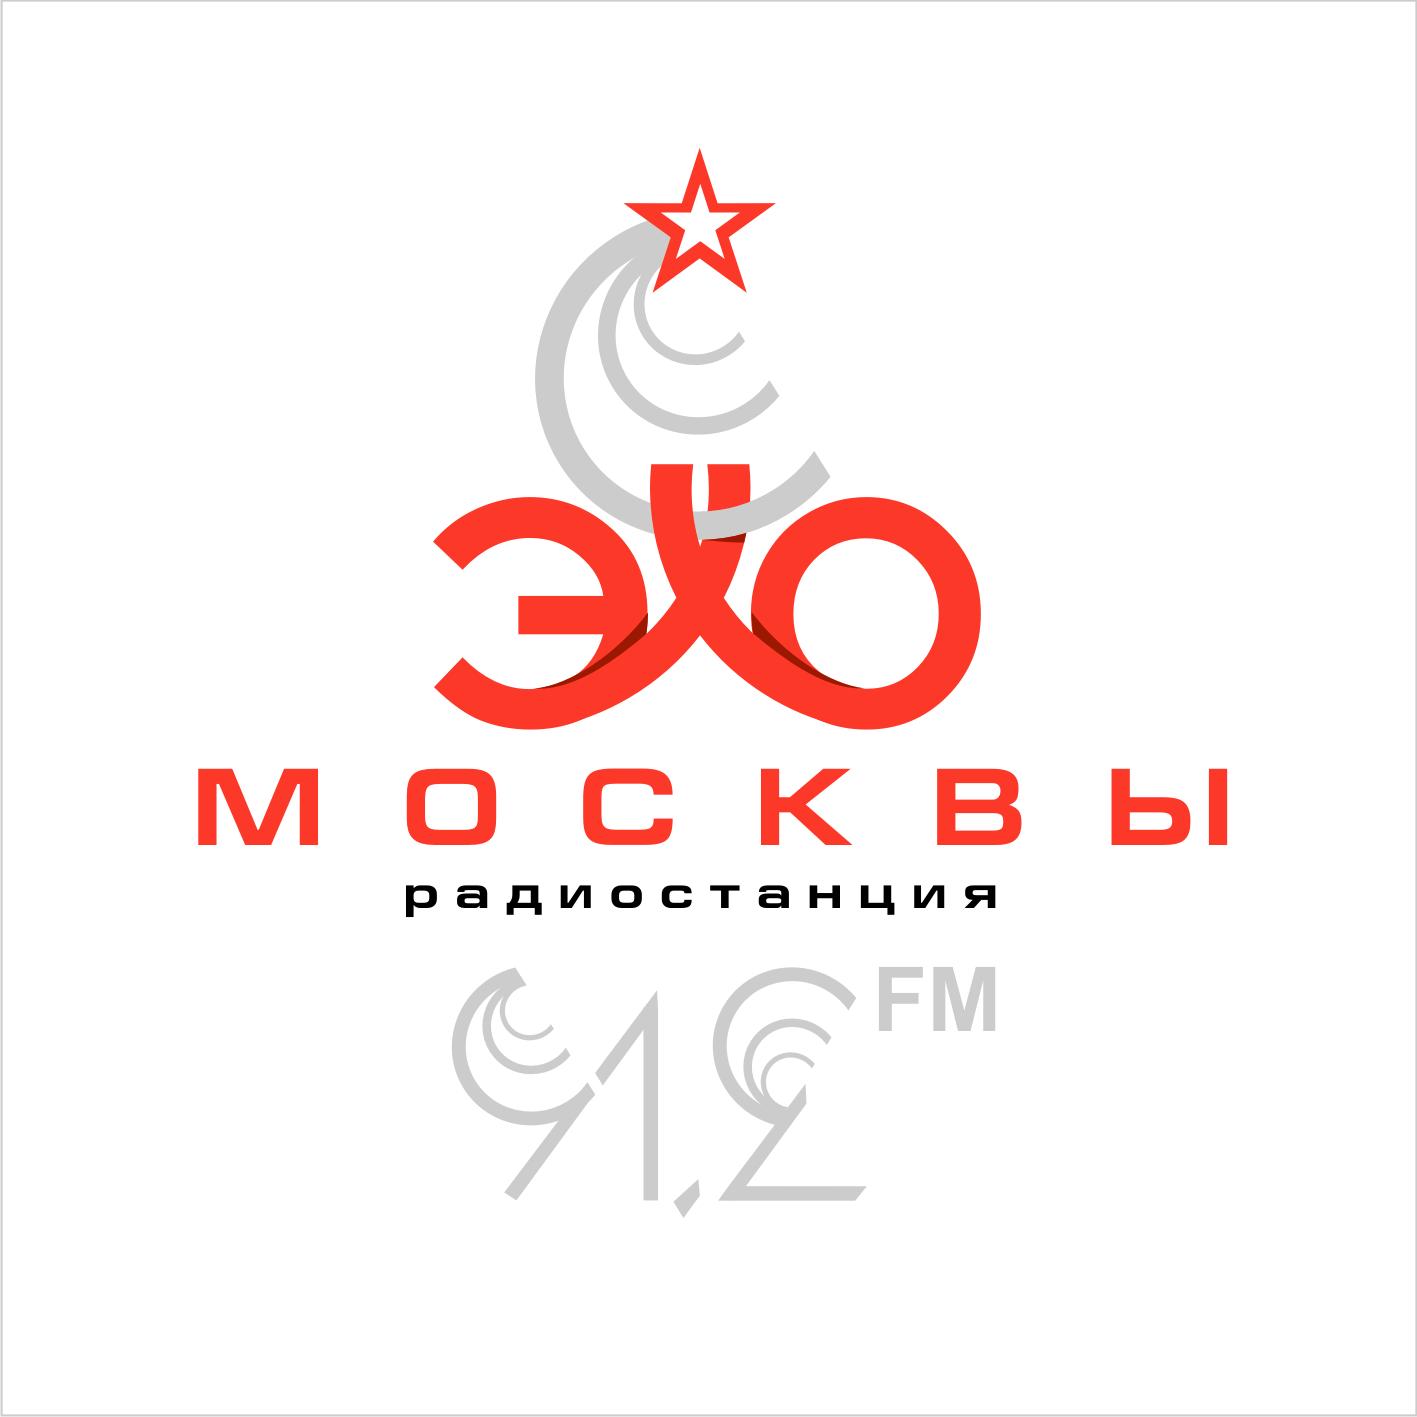 Дизайн логотипа р/с Эхо Москвы. фото f_93456266f4d2787c.jpg